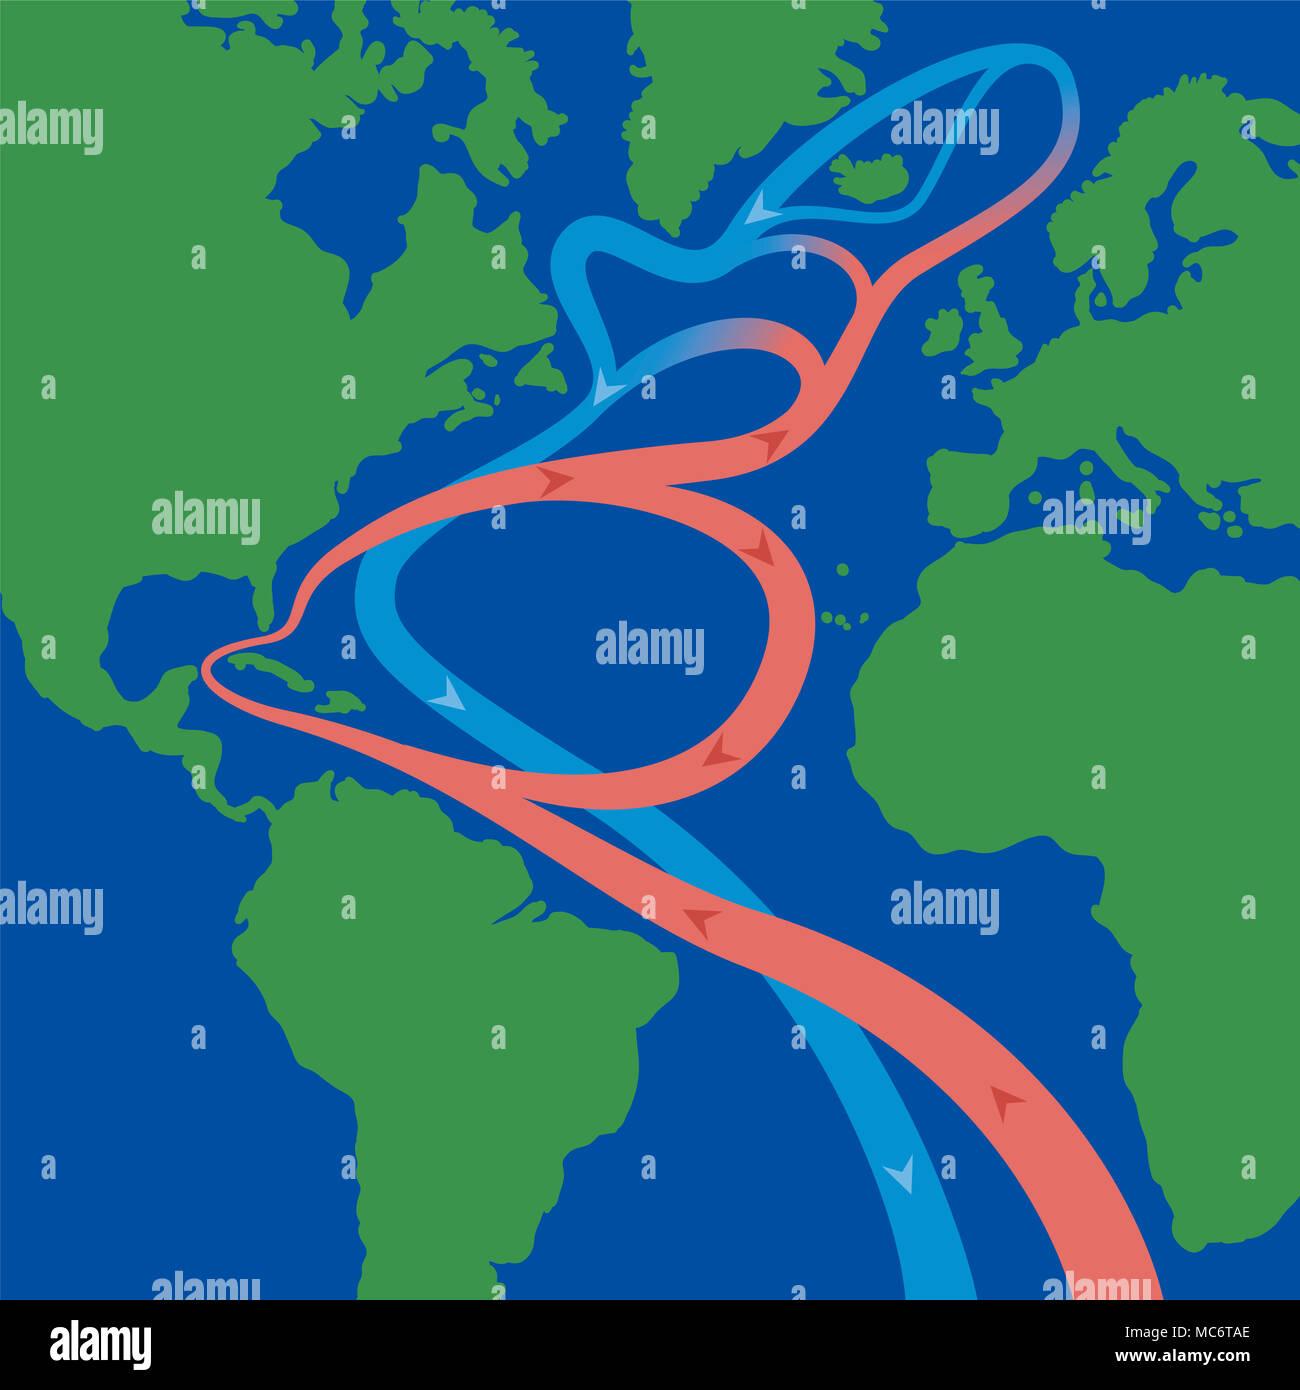 north atlantic ocean map stock photos amp north atlantic